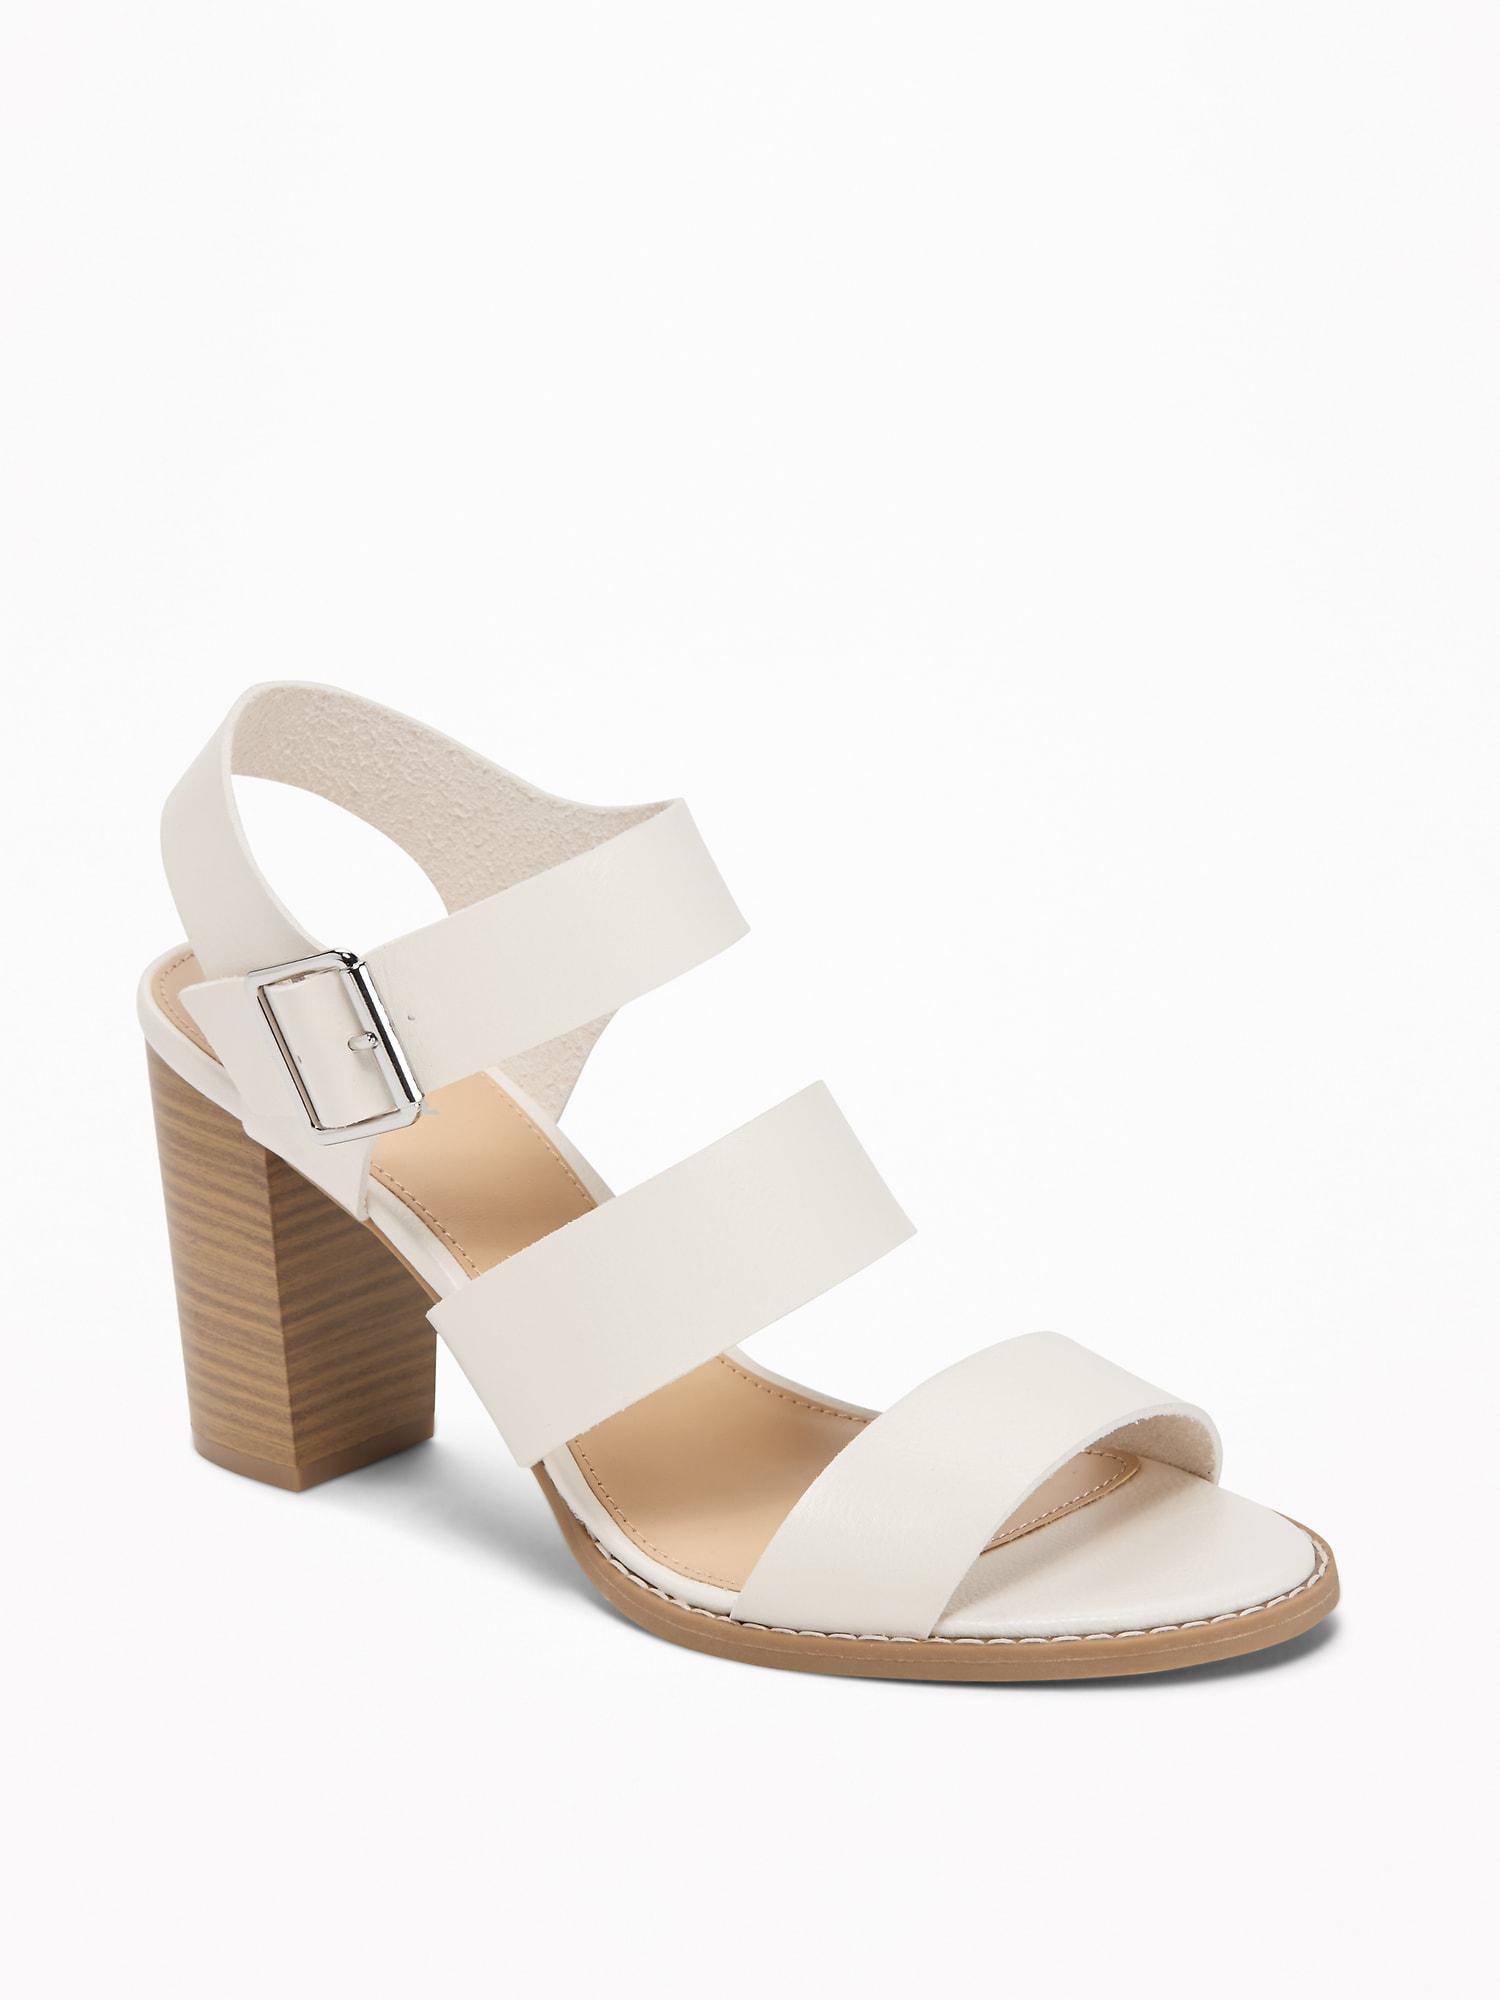 00f0e1e314e ... Three-strap Block-heel Sandals - Lyst. View fullscreen